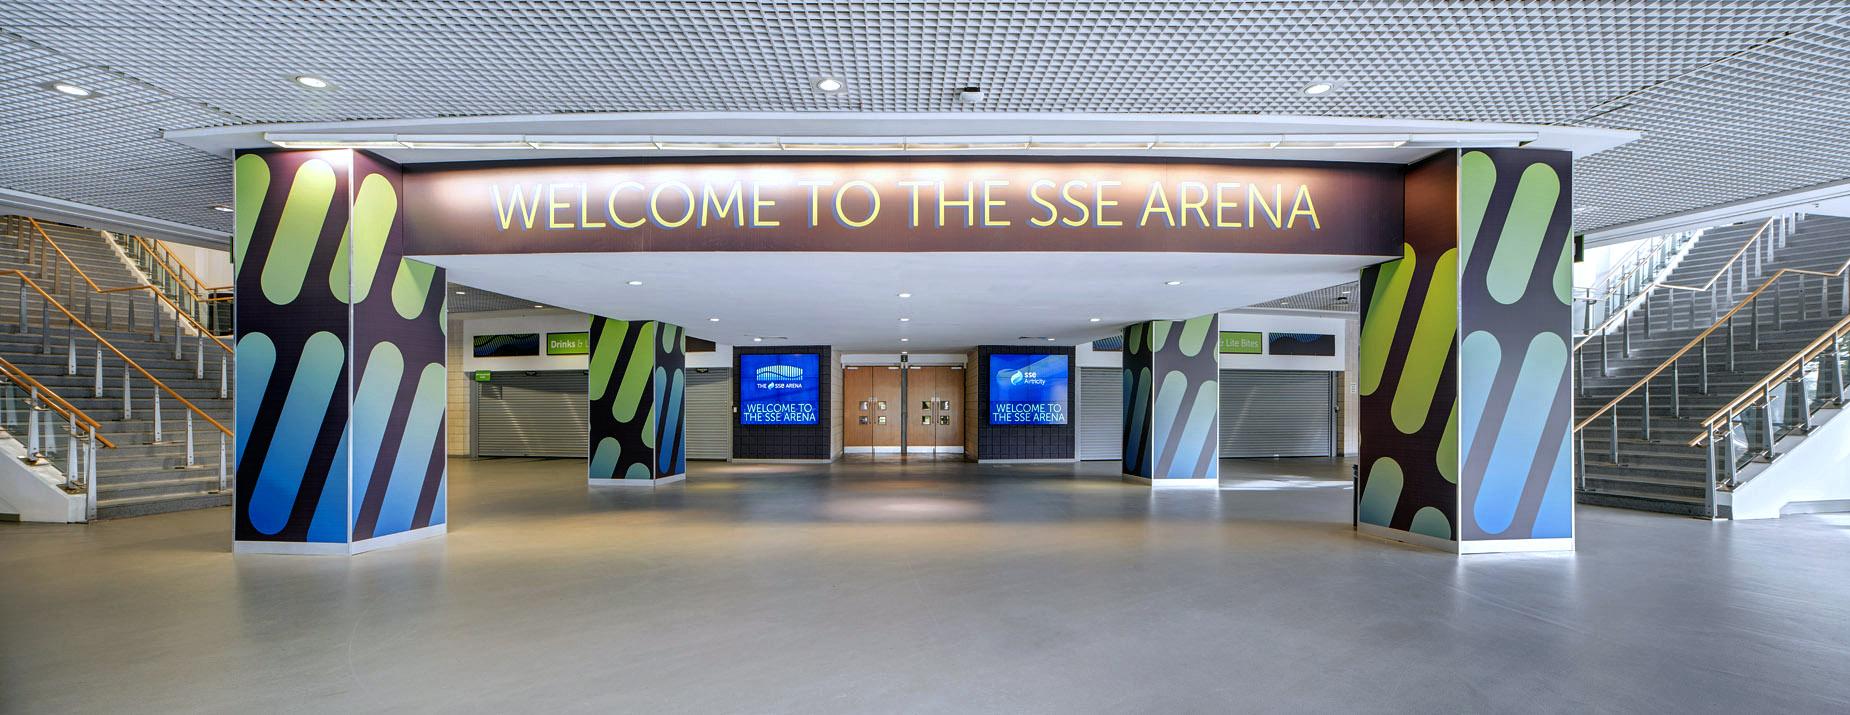 SSE Airtricity Arena - Trip 1_DSC5225a copyc